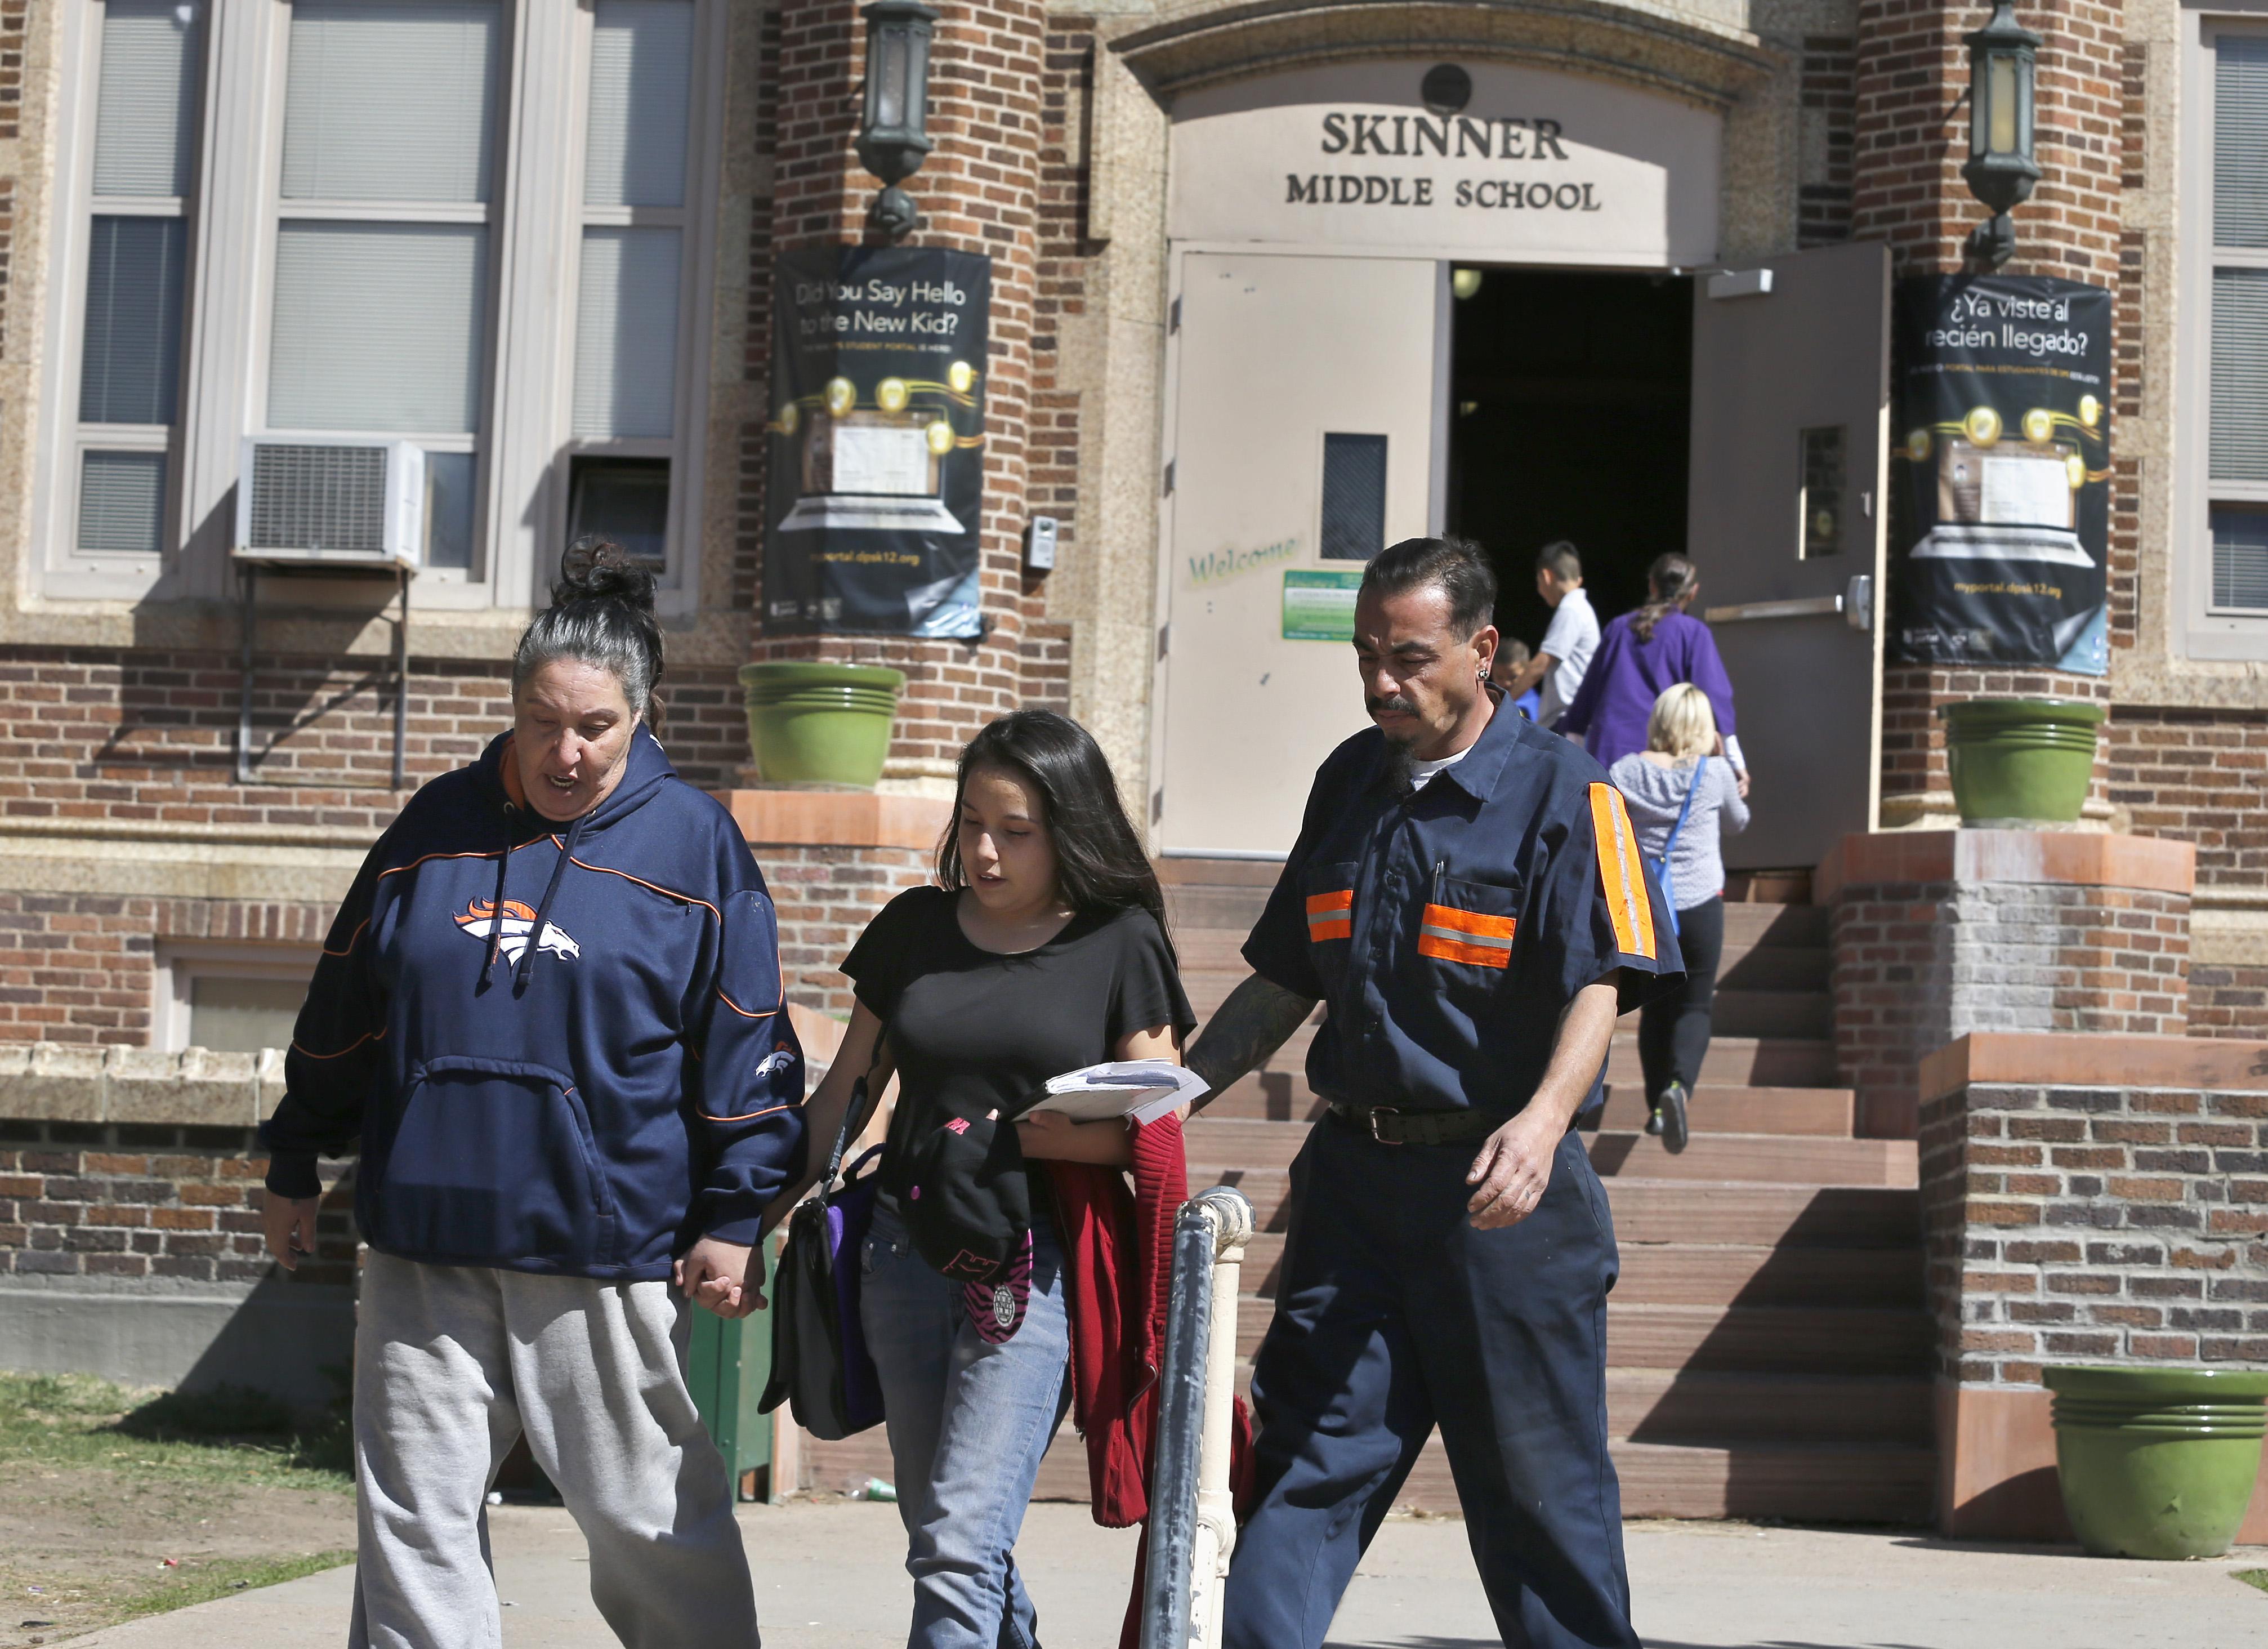 Photo: Skinner Middle School (AP Photo)